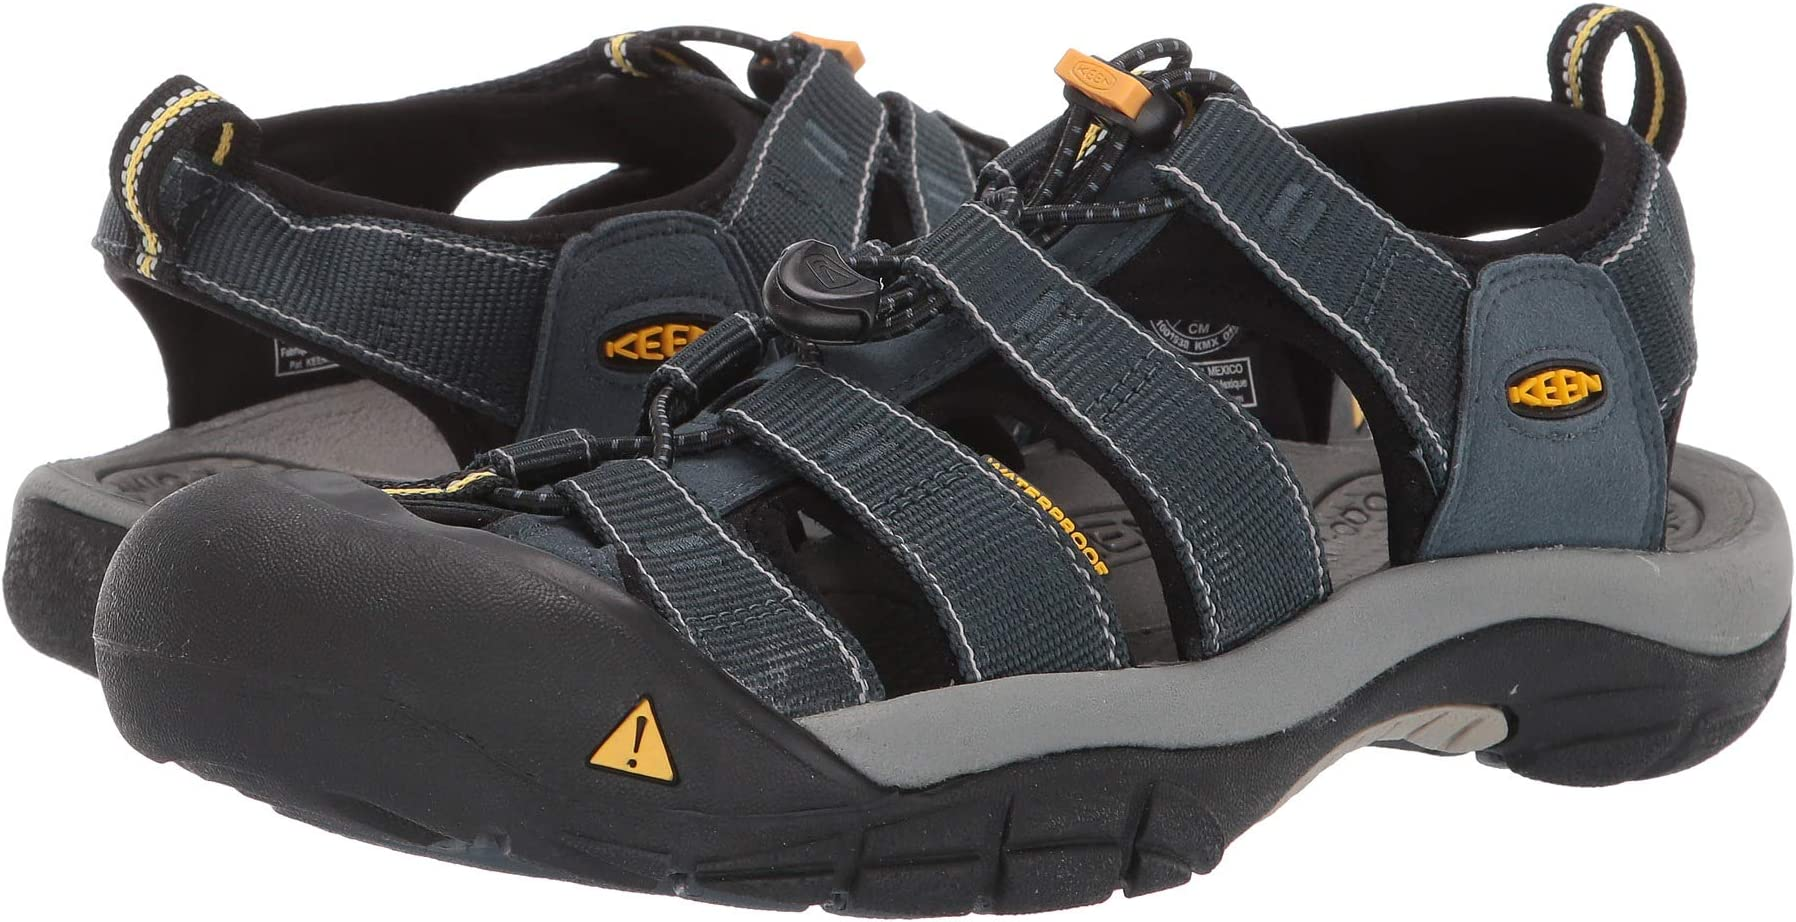 TC-5-Sandals-2020-05-12